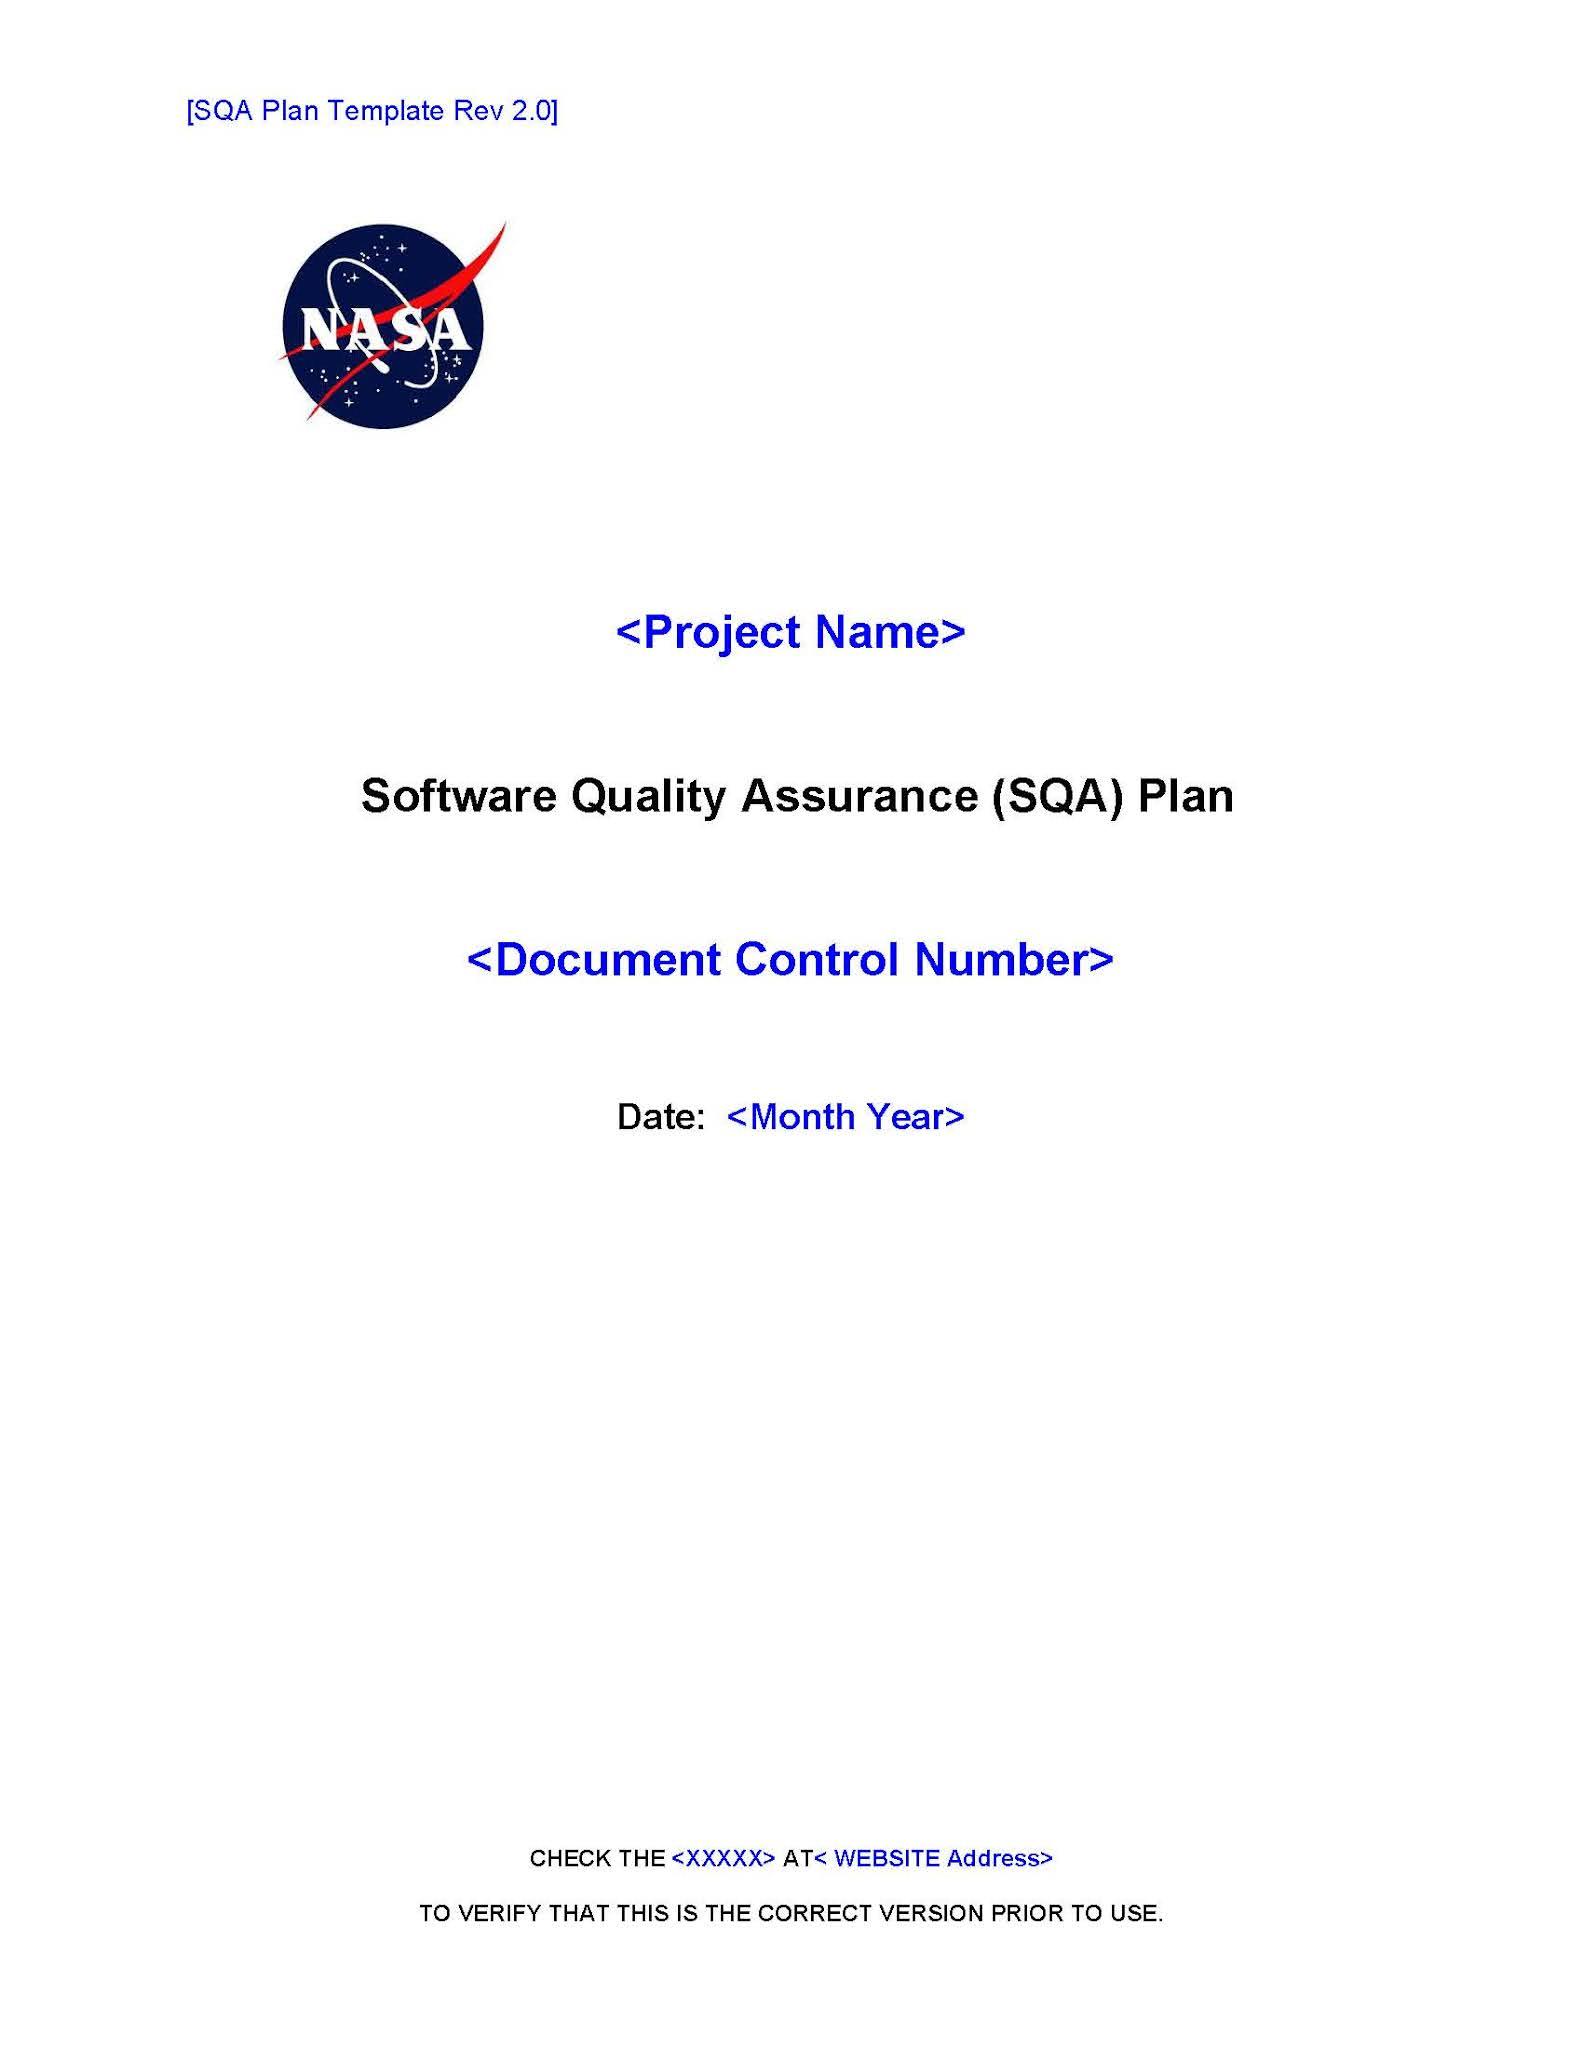 Software quality assurance plan template